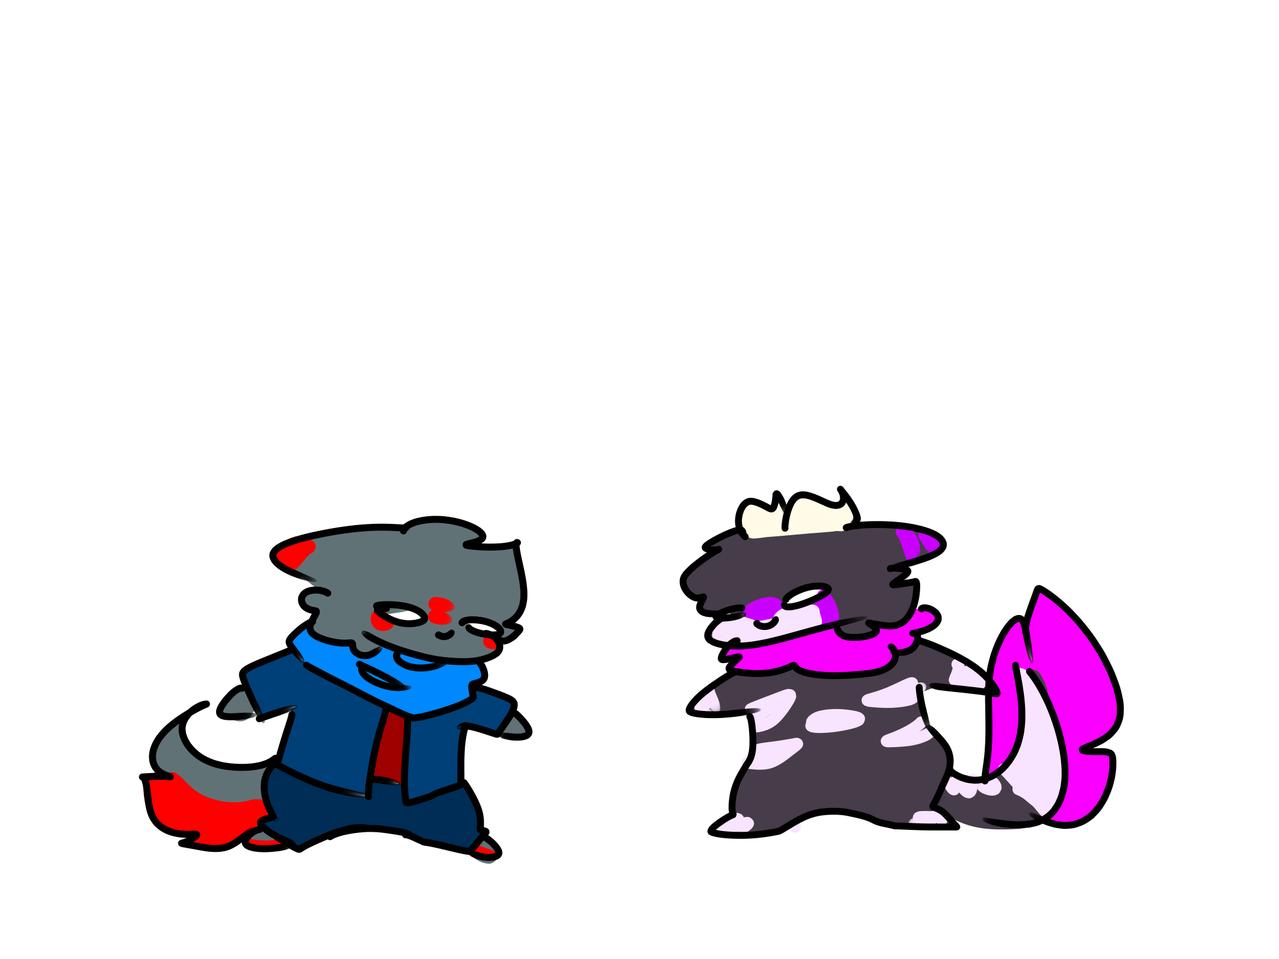 Bonk Illust of GhostTheBeast (Logan mode) Bonk